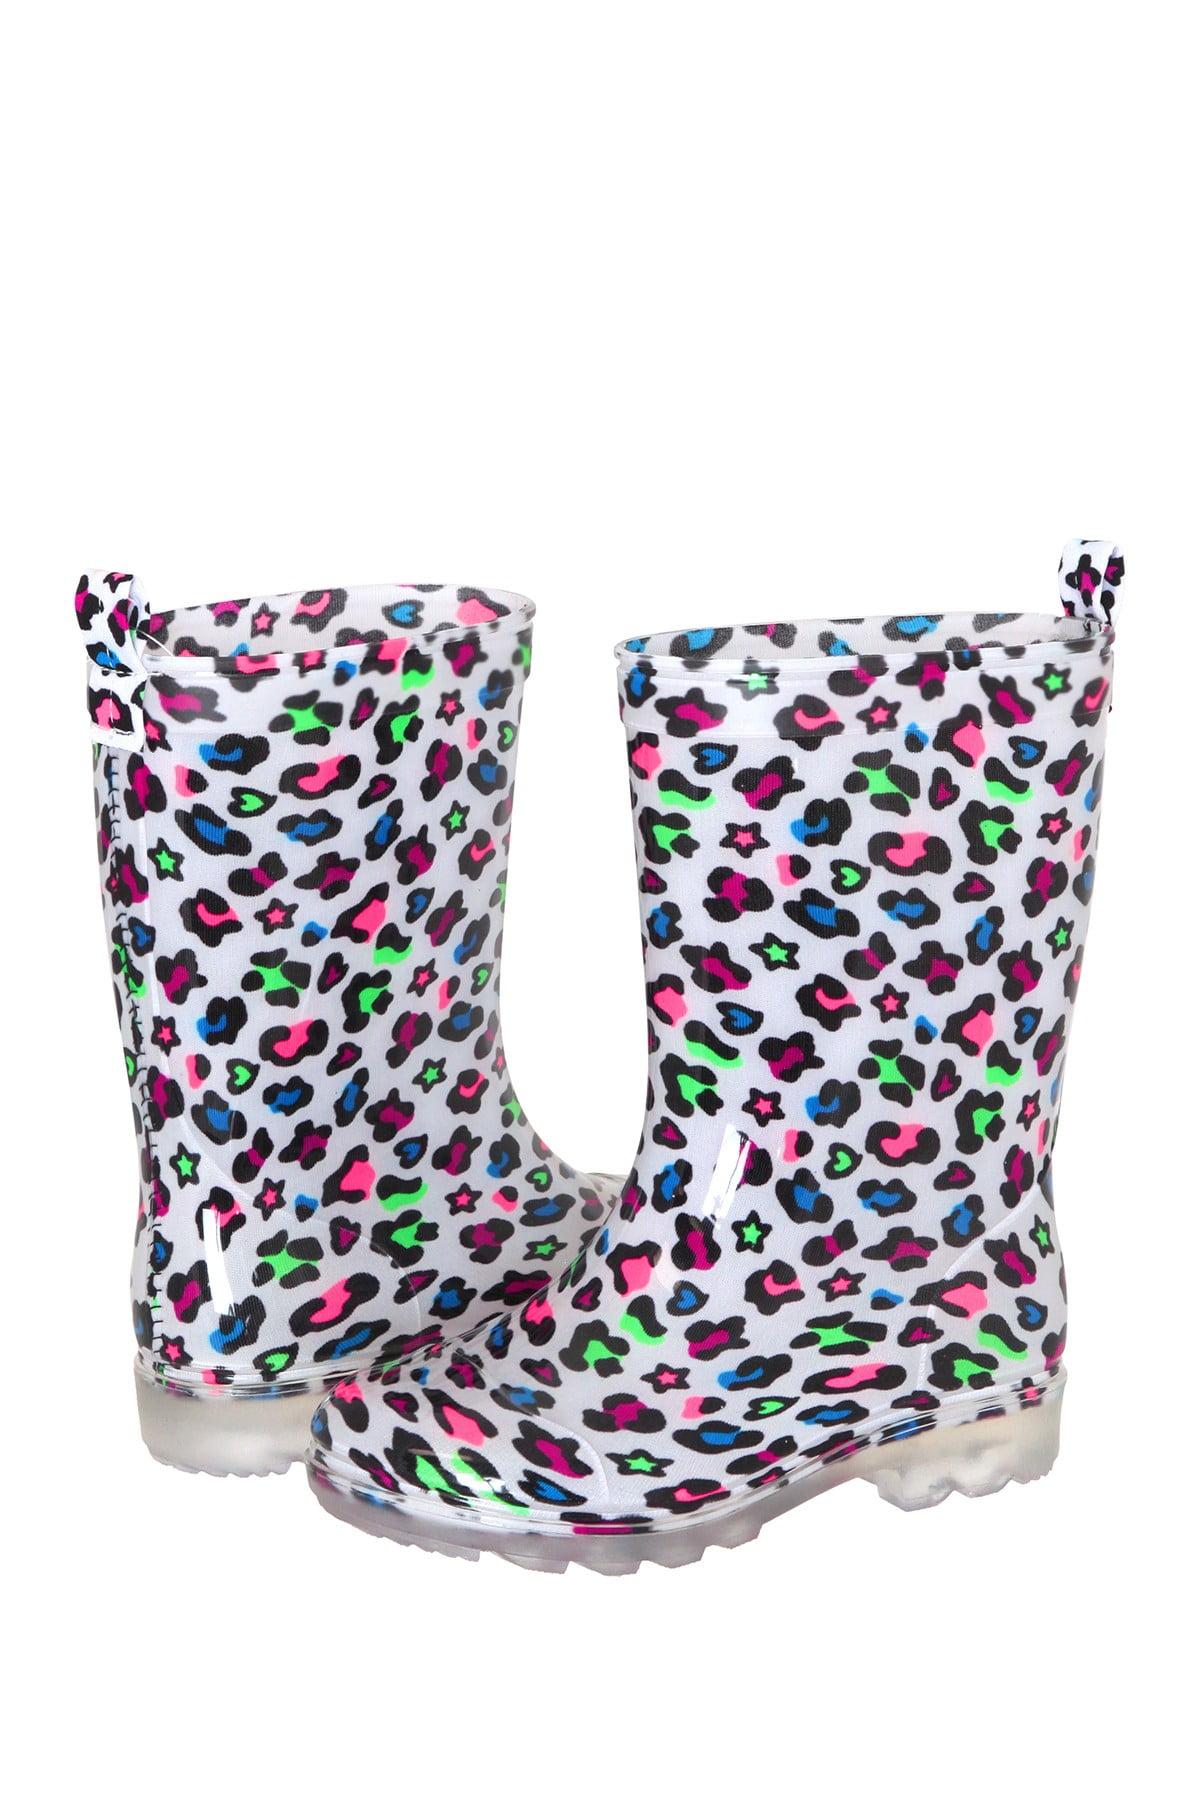 Capelli of New York Kids' Rain Boots (Dinosaur, Camo, Mermaid, Seashells, Hearts & Stars) $7.65 at Nordstrom Rack w/ Free Store Pickup